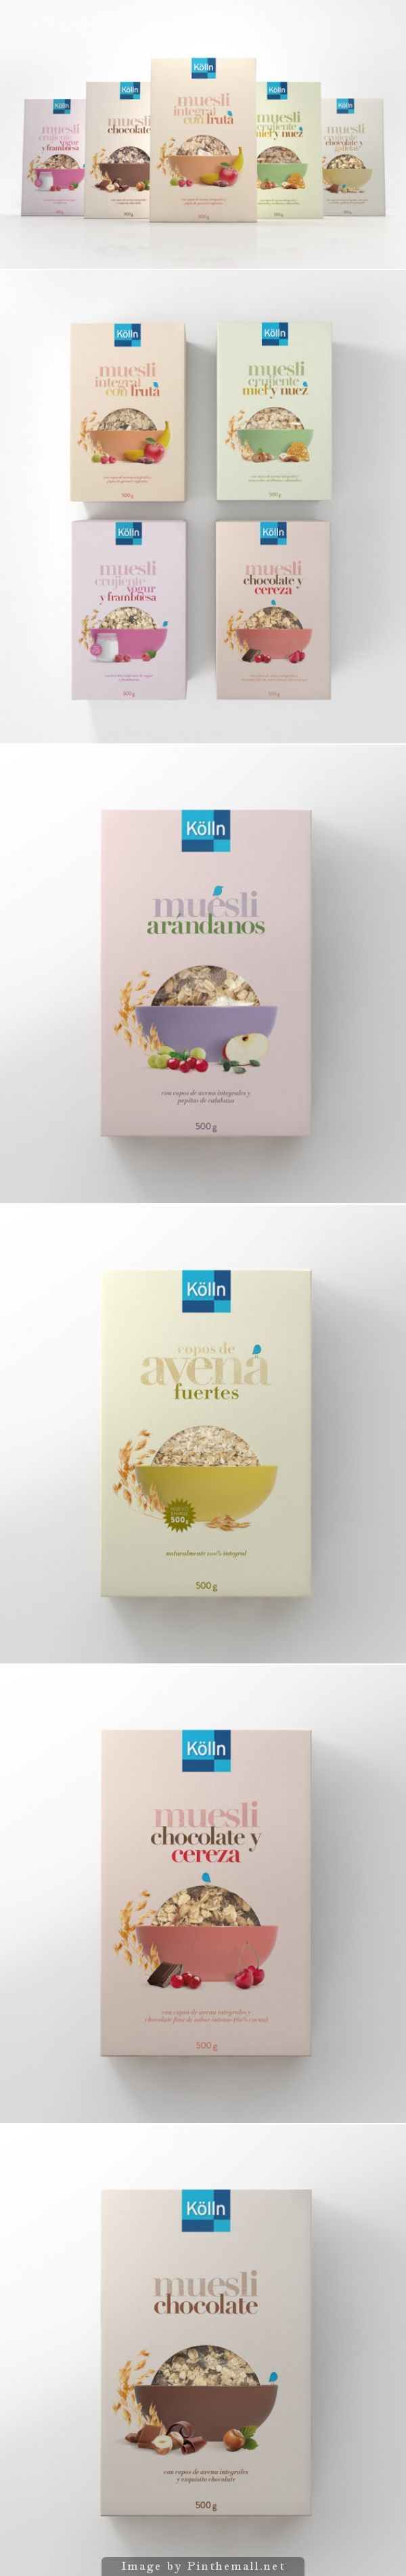 Kölln Oats, Creative Agency: Lavernia & Cienfuegos